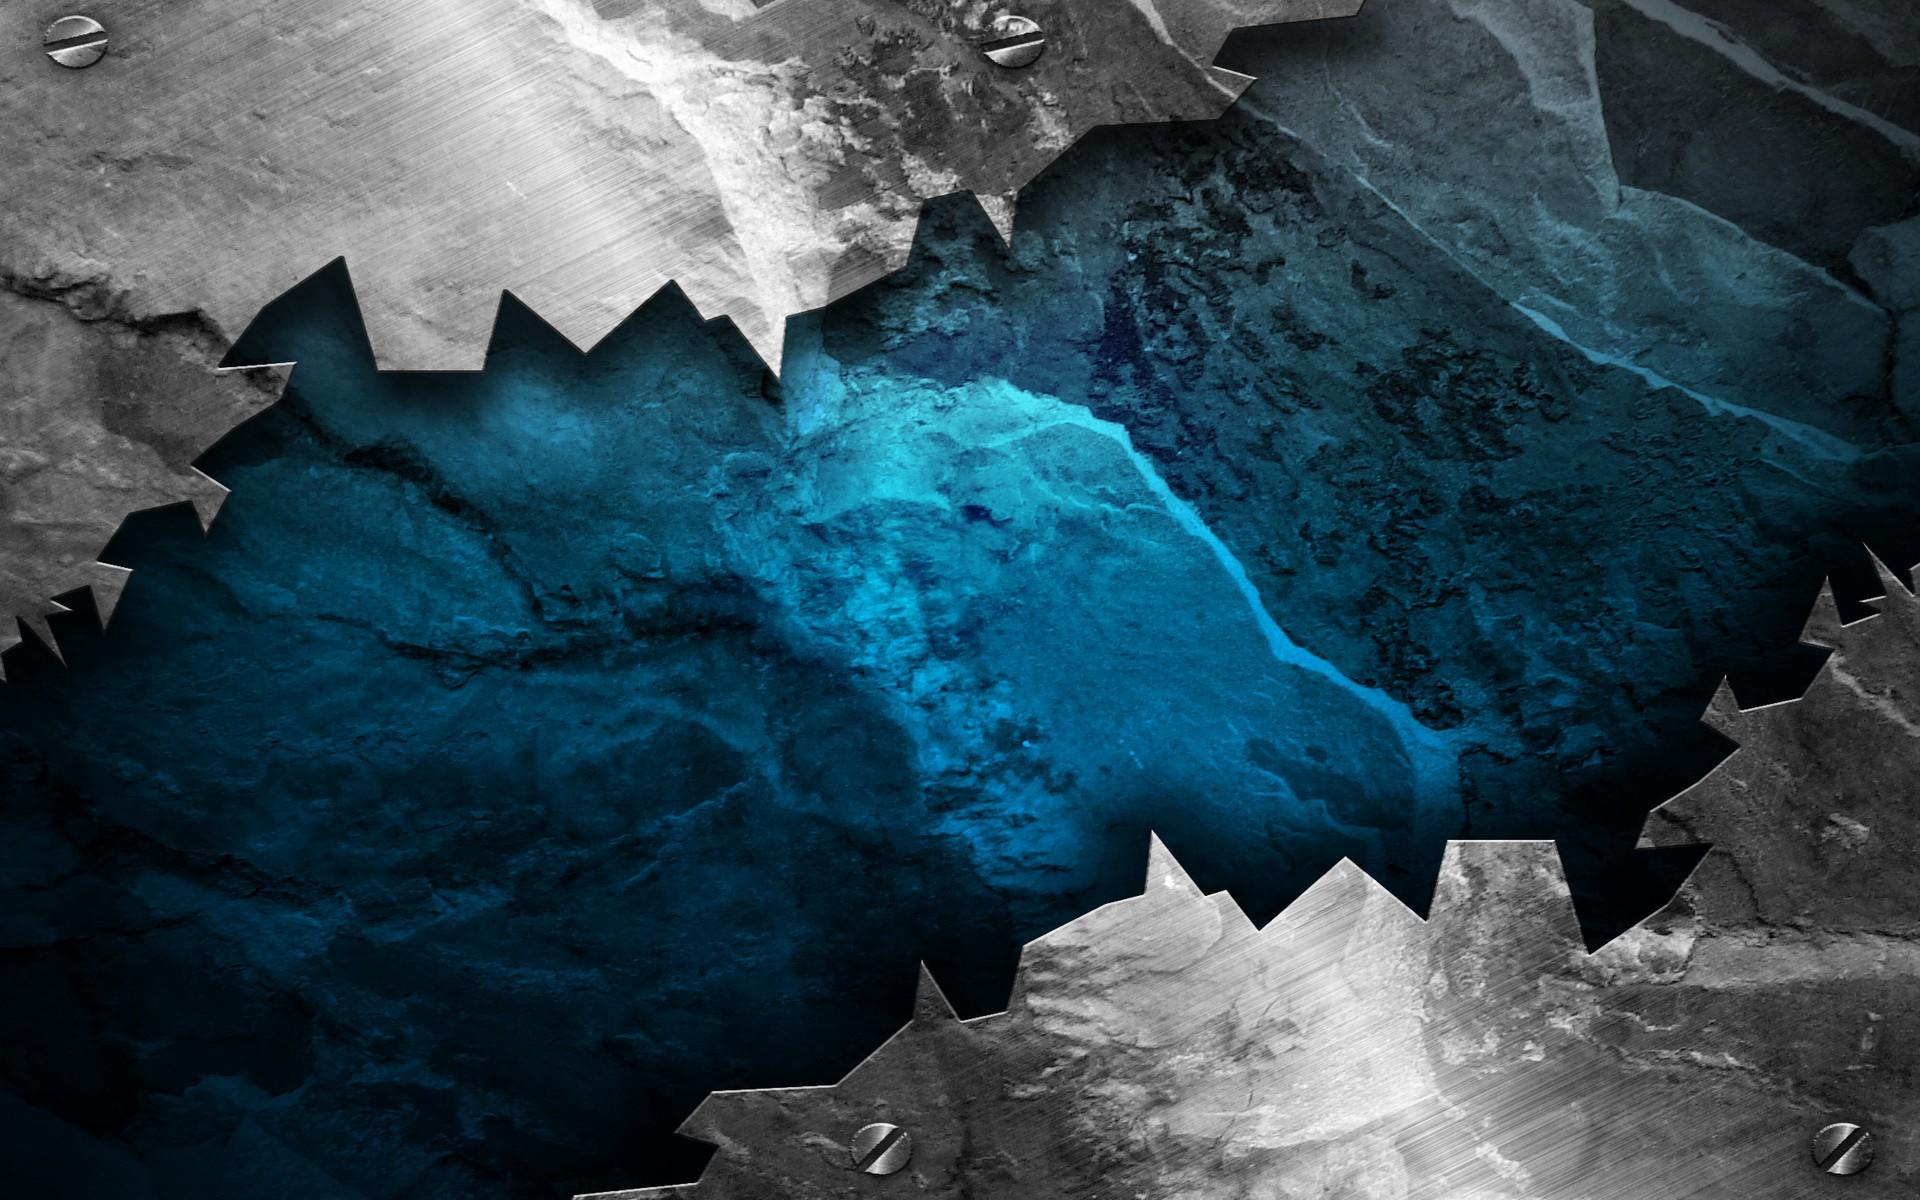 Zelda Iphone Wallpaper Blue Grunge Background 183 ① Download Free Beautiful